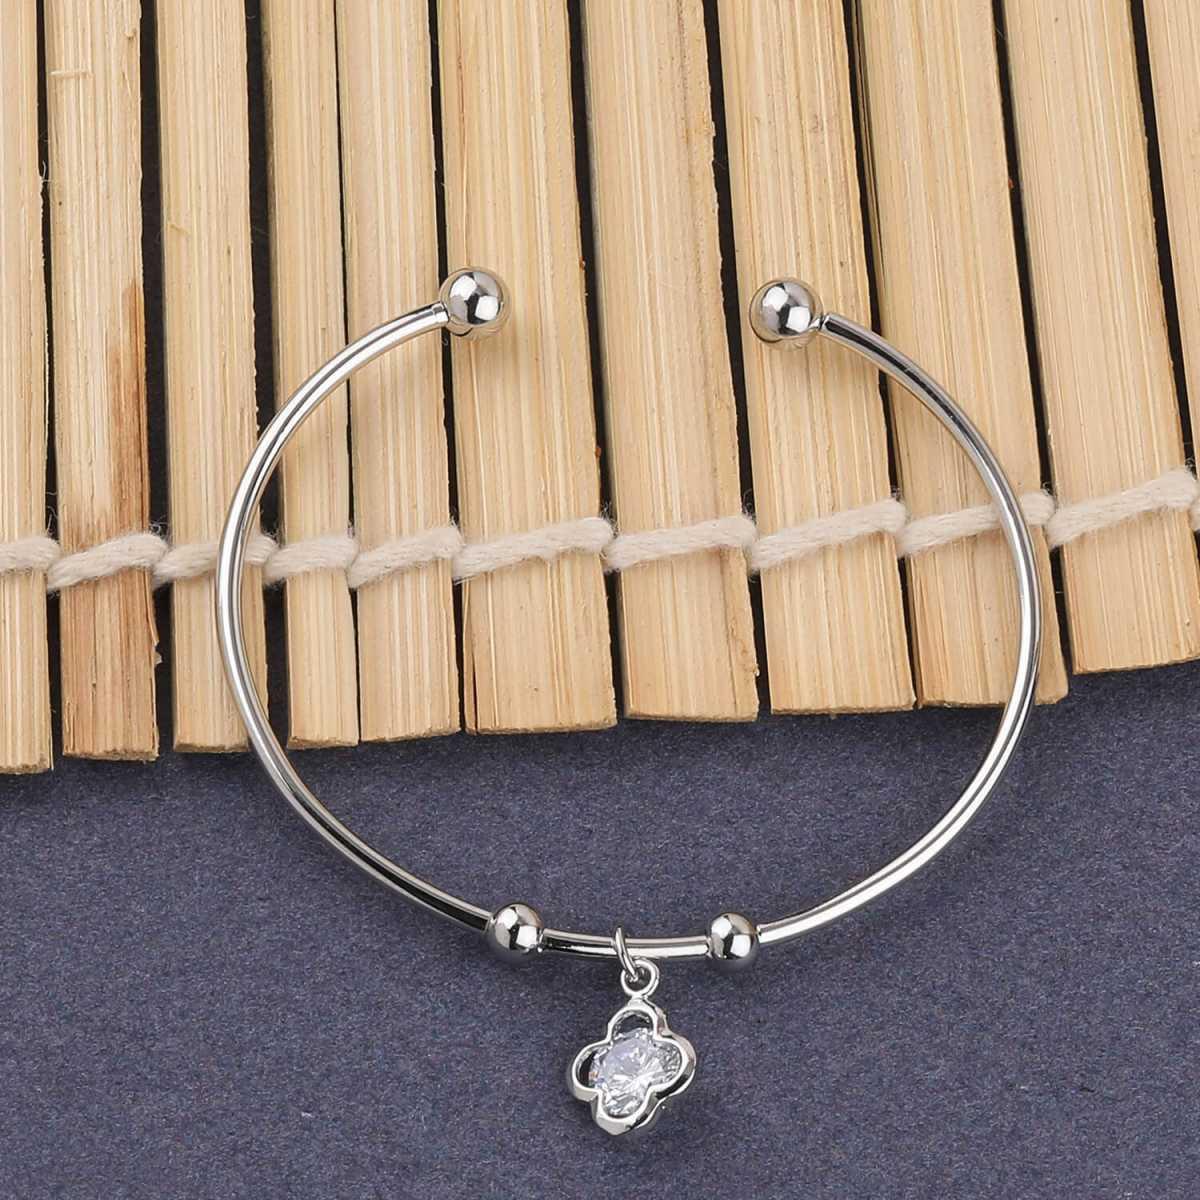 SILVER SHINE Stylish Party Wear Adjustable Bracelet With Diamond For Women Girls